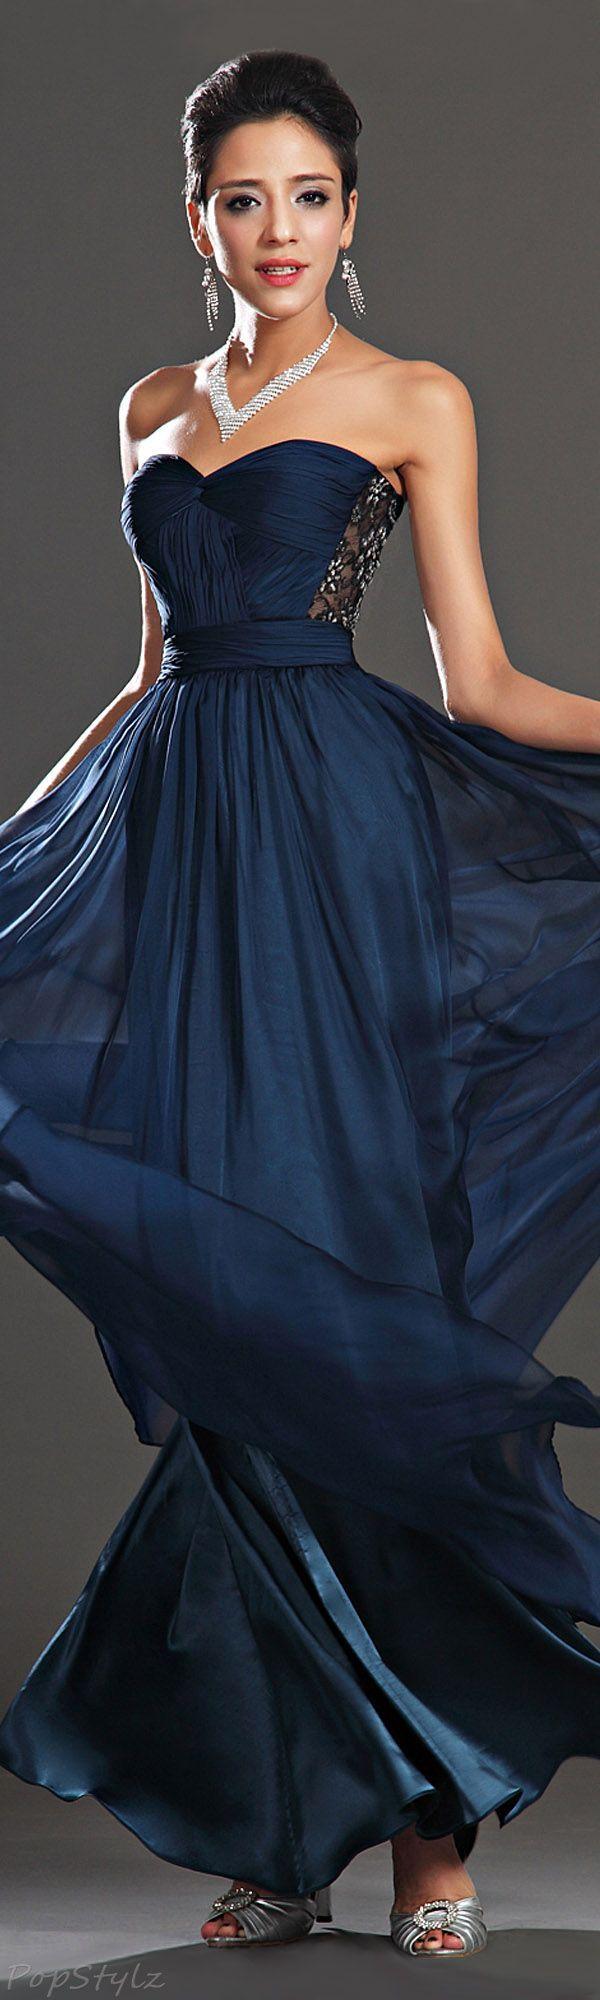 Best 25 Dark Blue Dresses Ideas On Pinterest Dark Blue